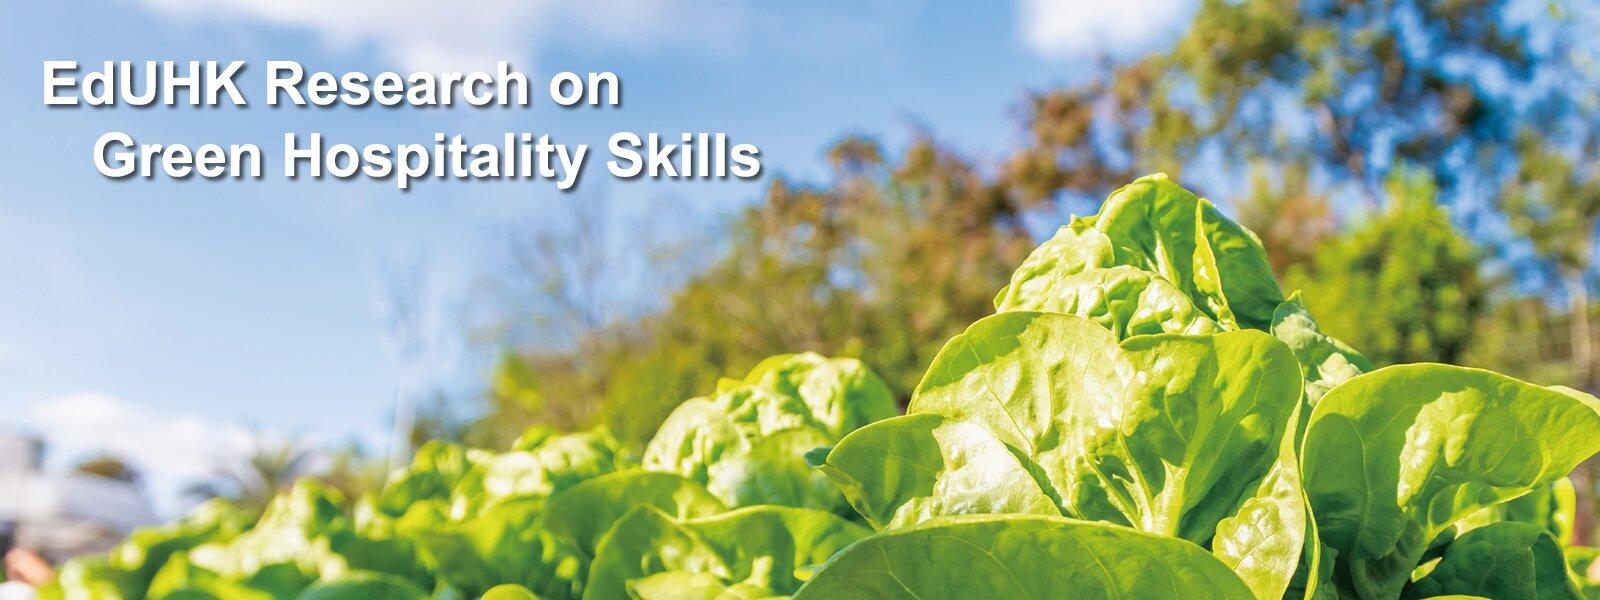 EdUHK Research on Green Hospitality Skills